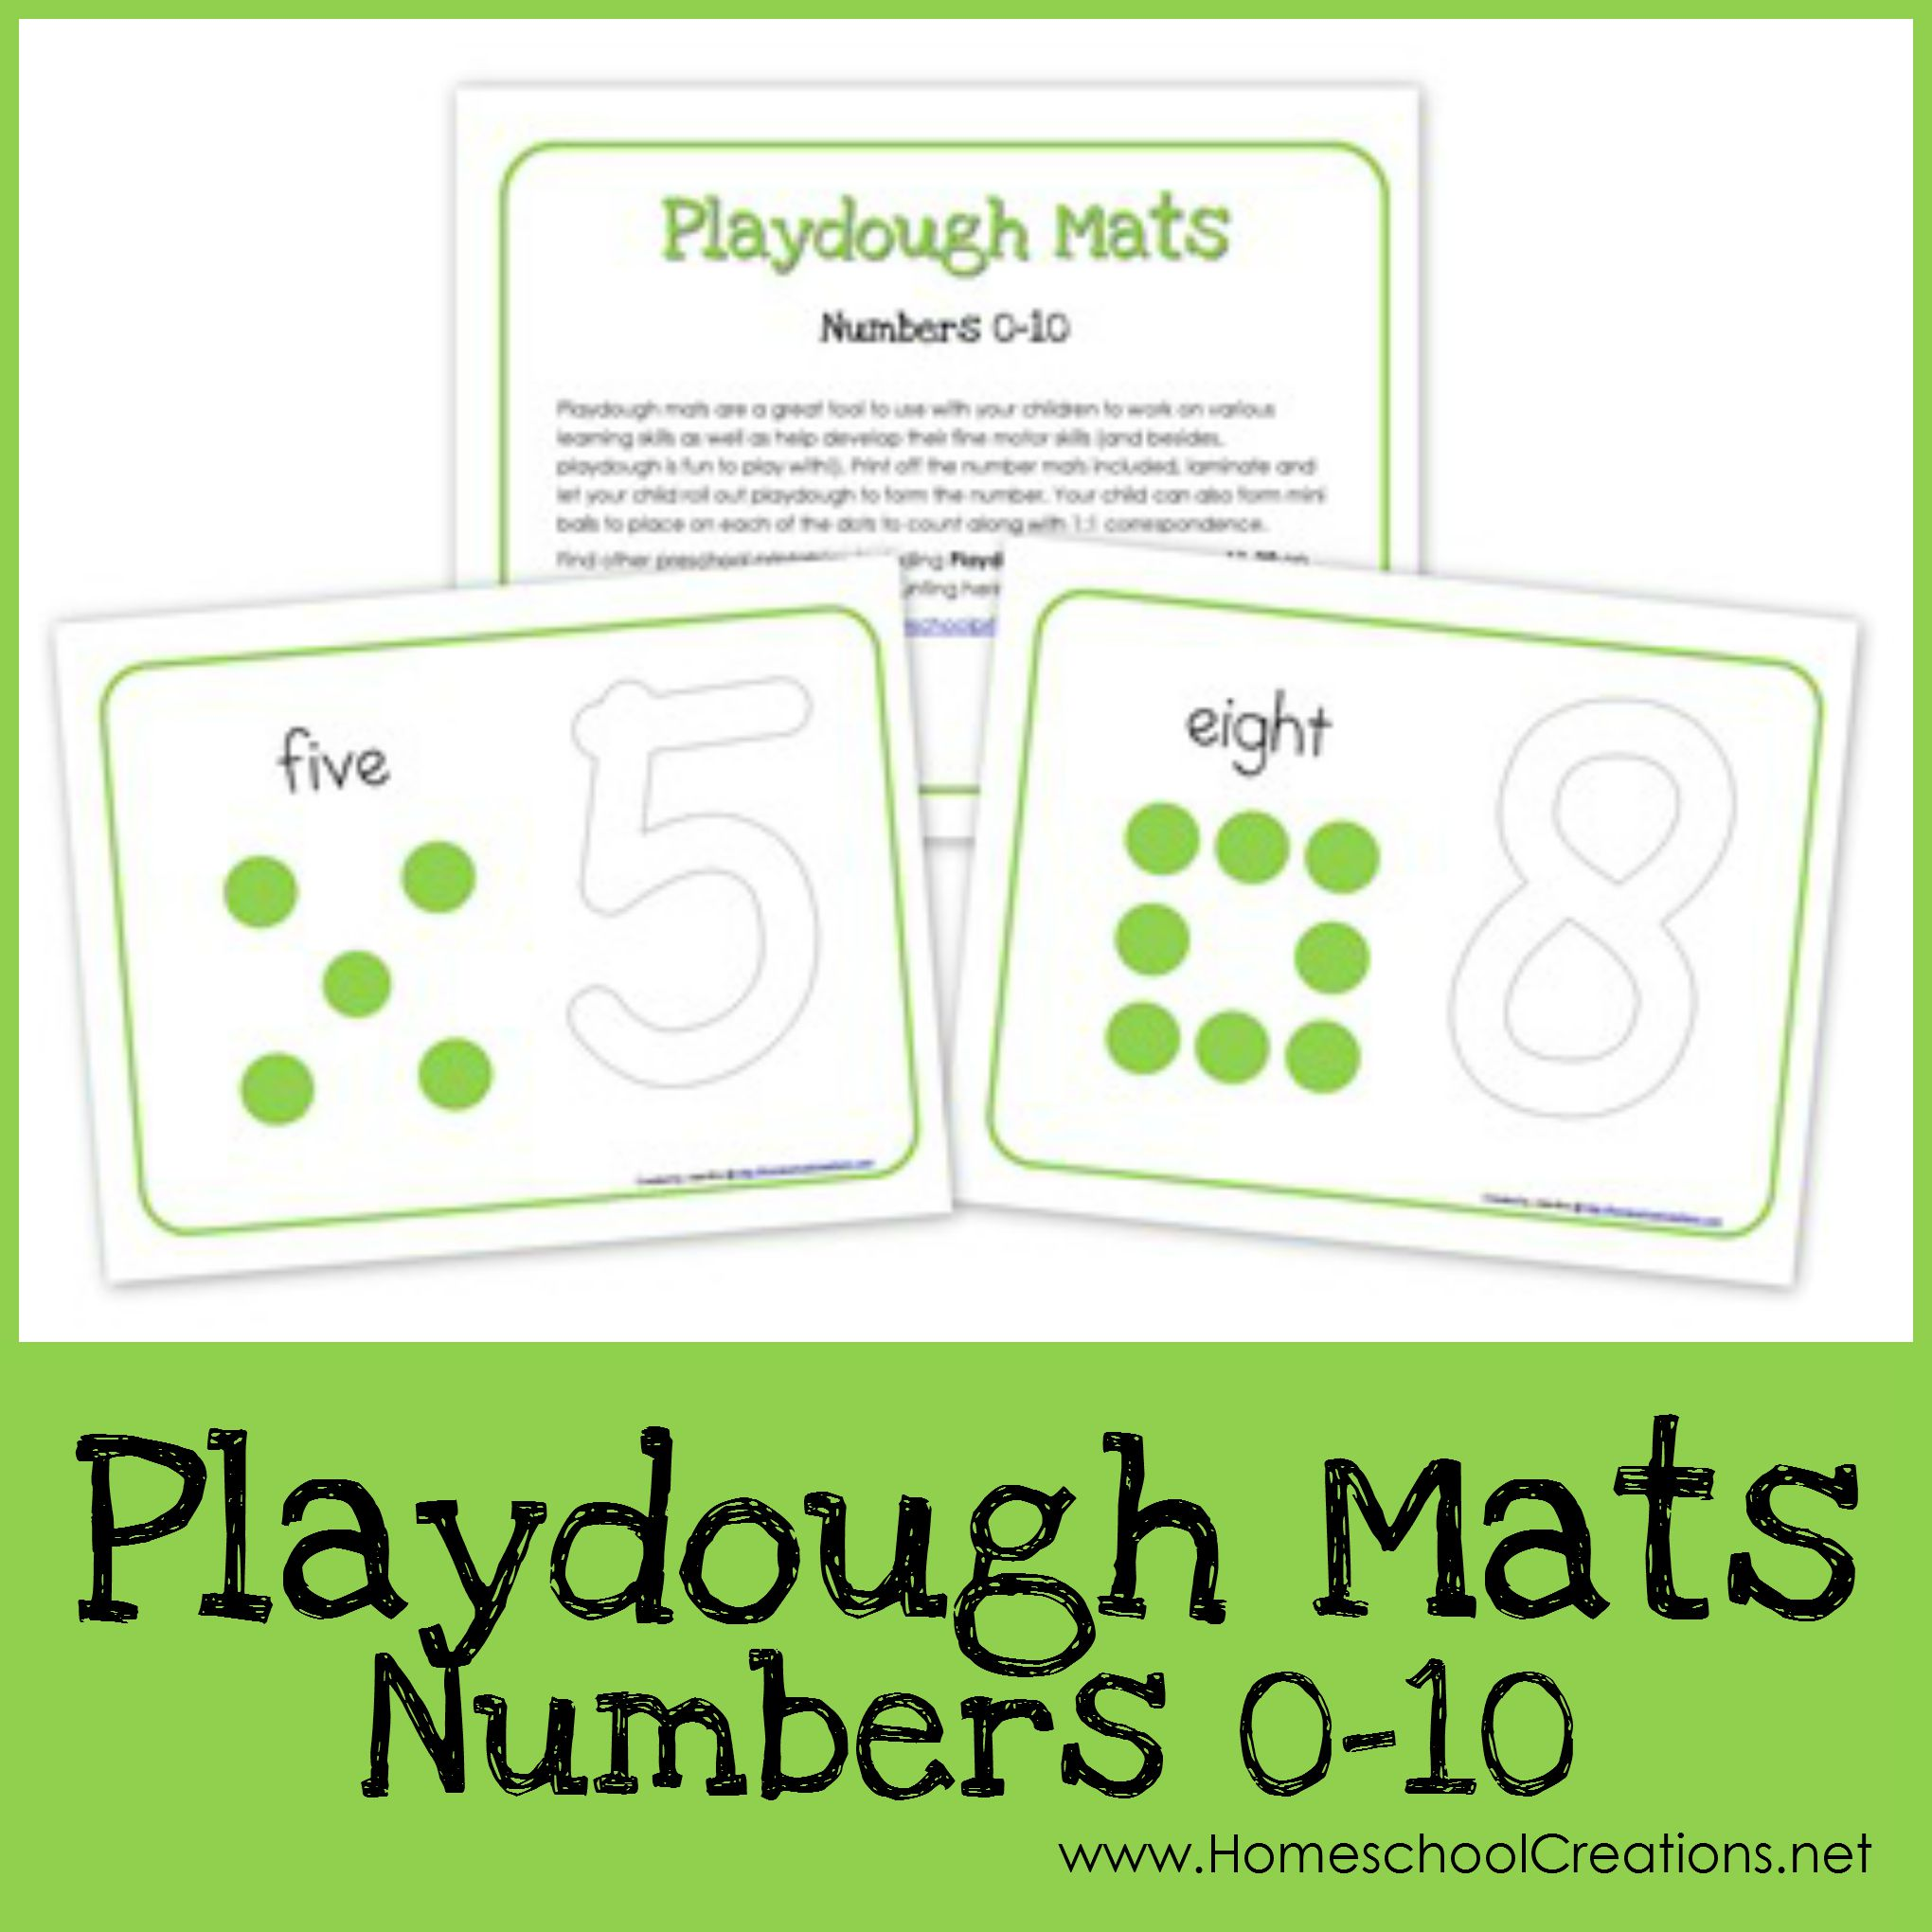 number playdough mats free printables